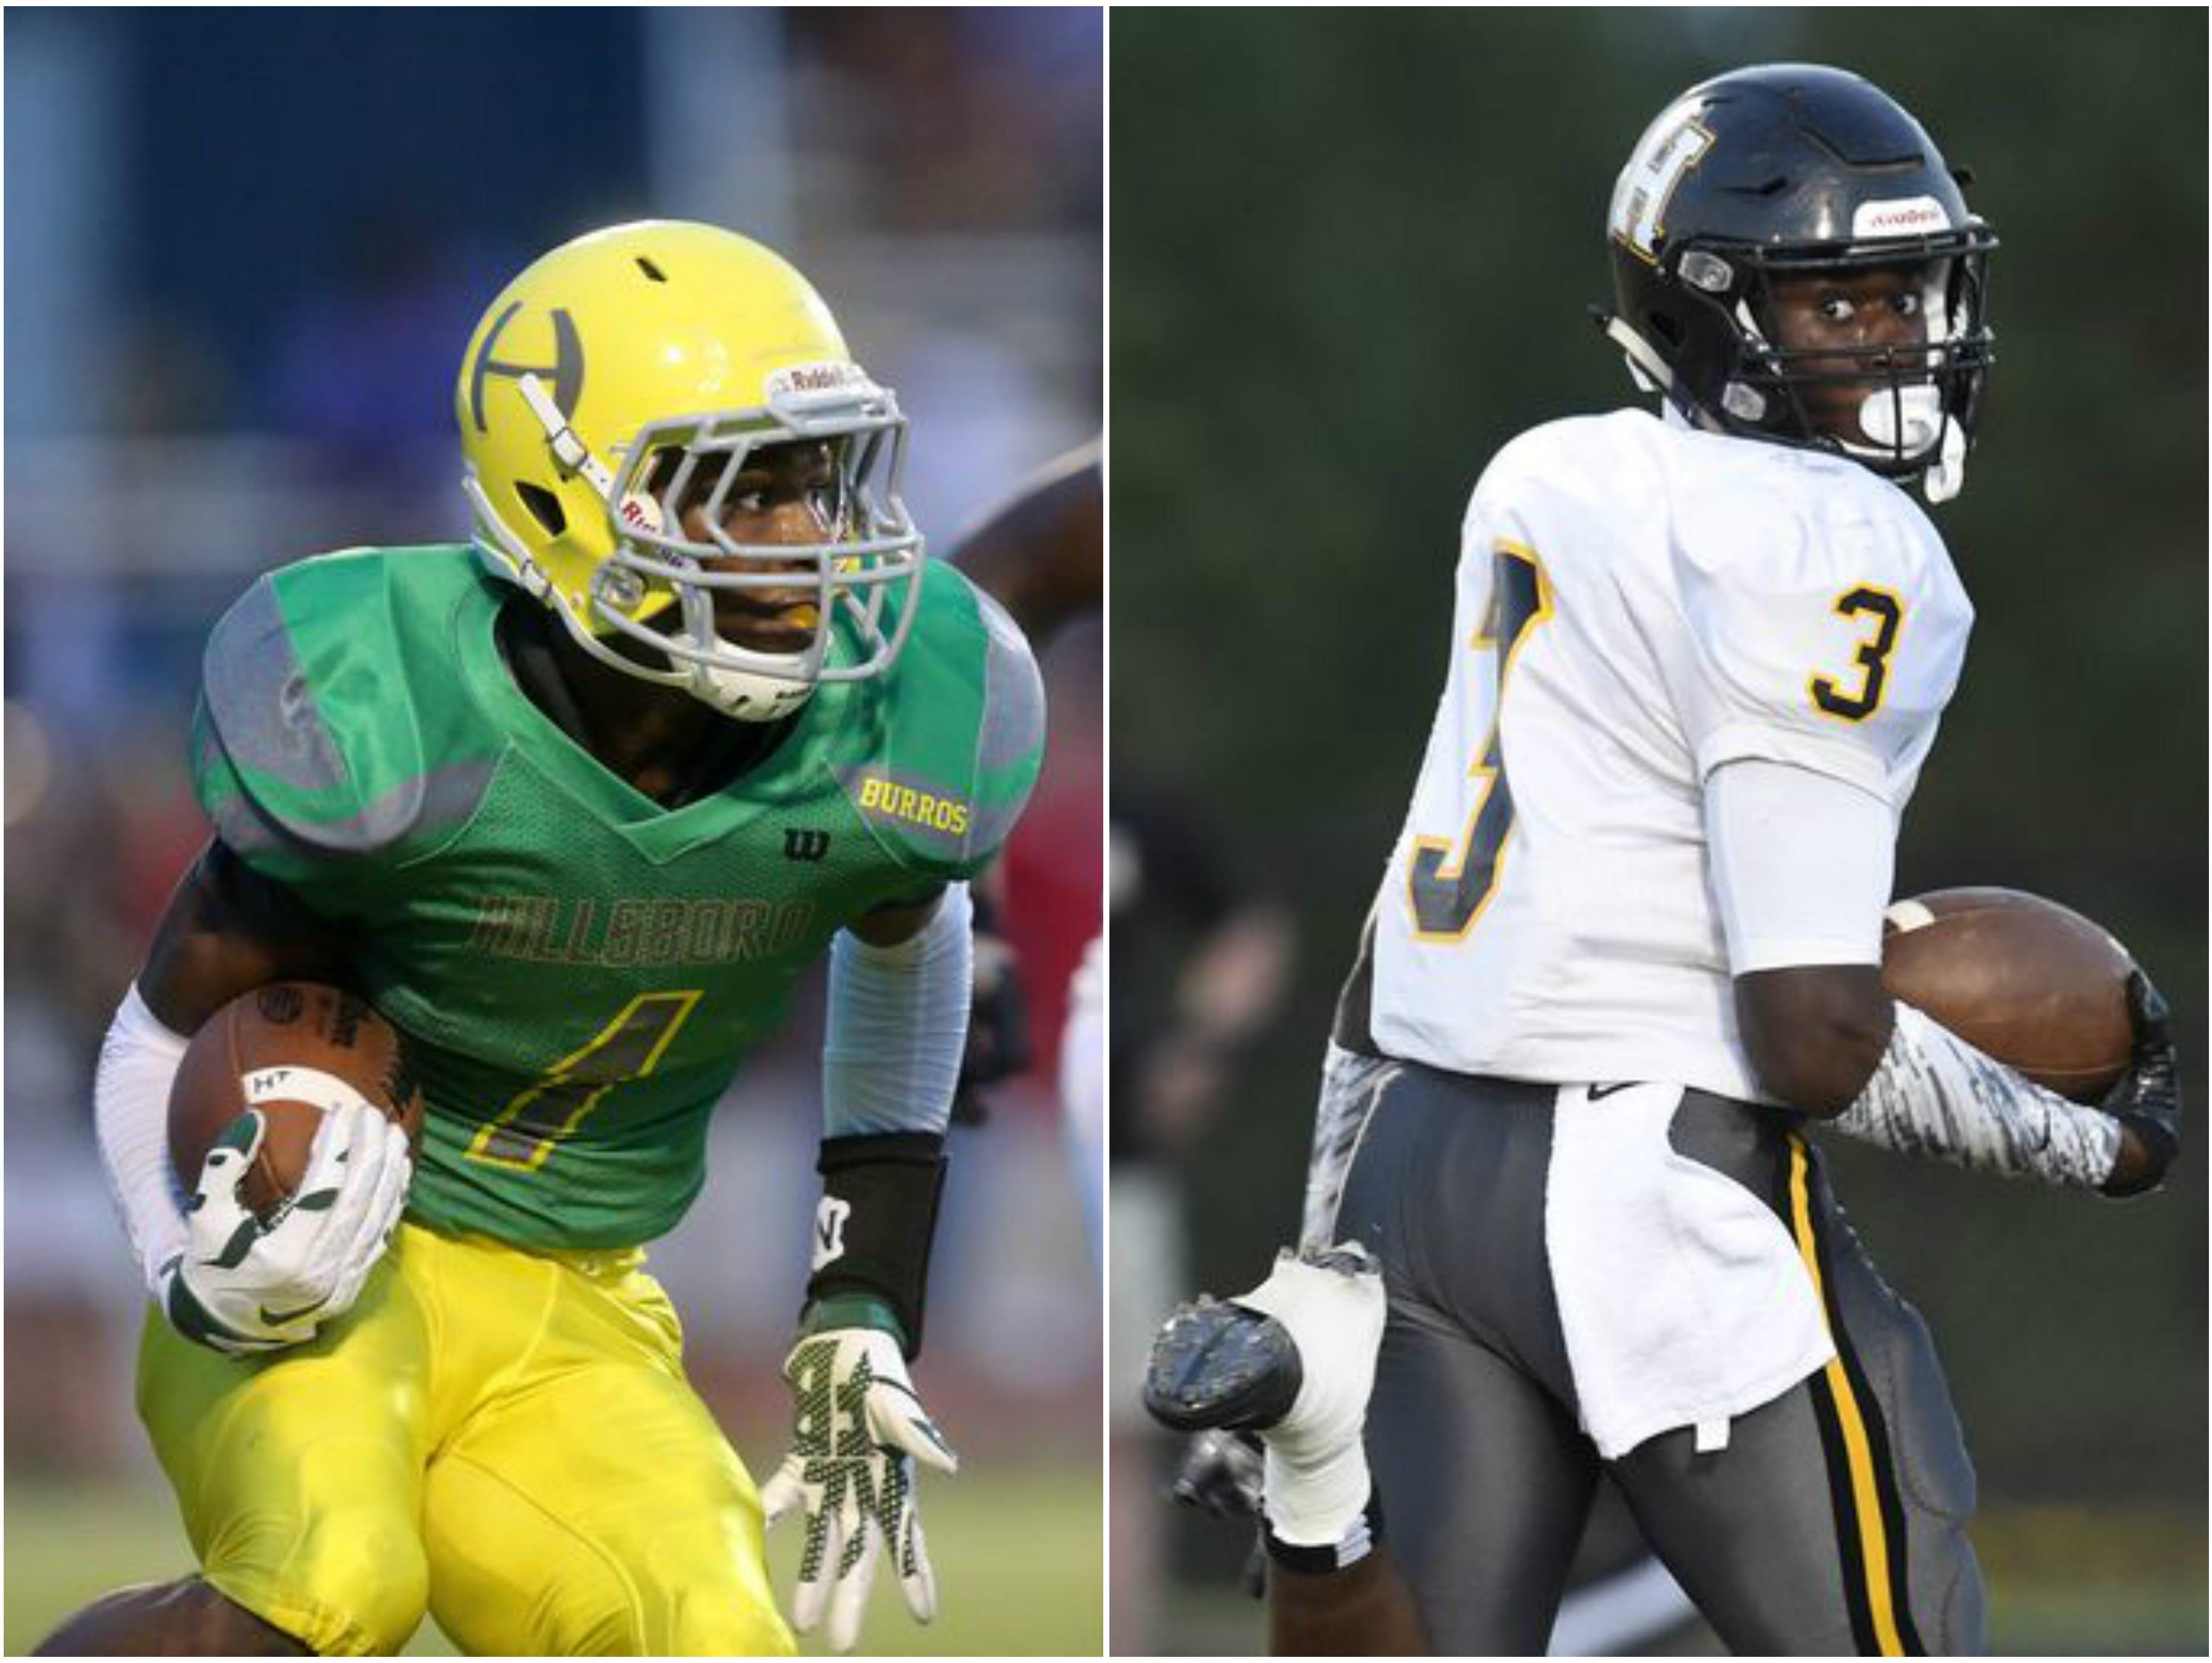 Hillsboro wide receiver JaVonta Payton (left) and Hendersonville running back Anthony Hughes (right)